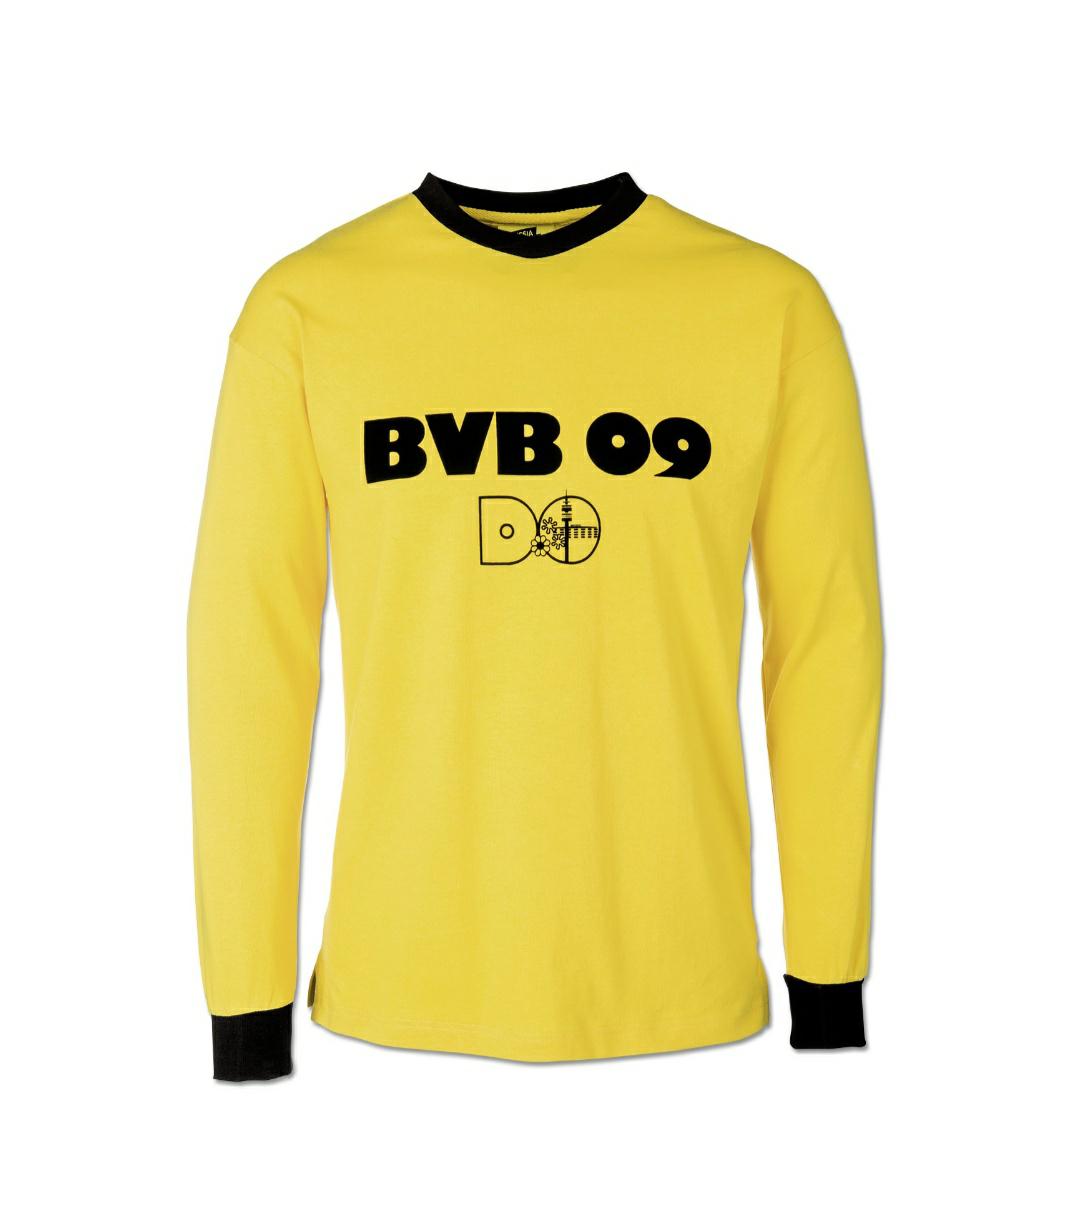 BVB Retrotrikot 1975 Borussia Dortmund Derby